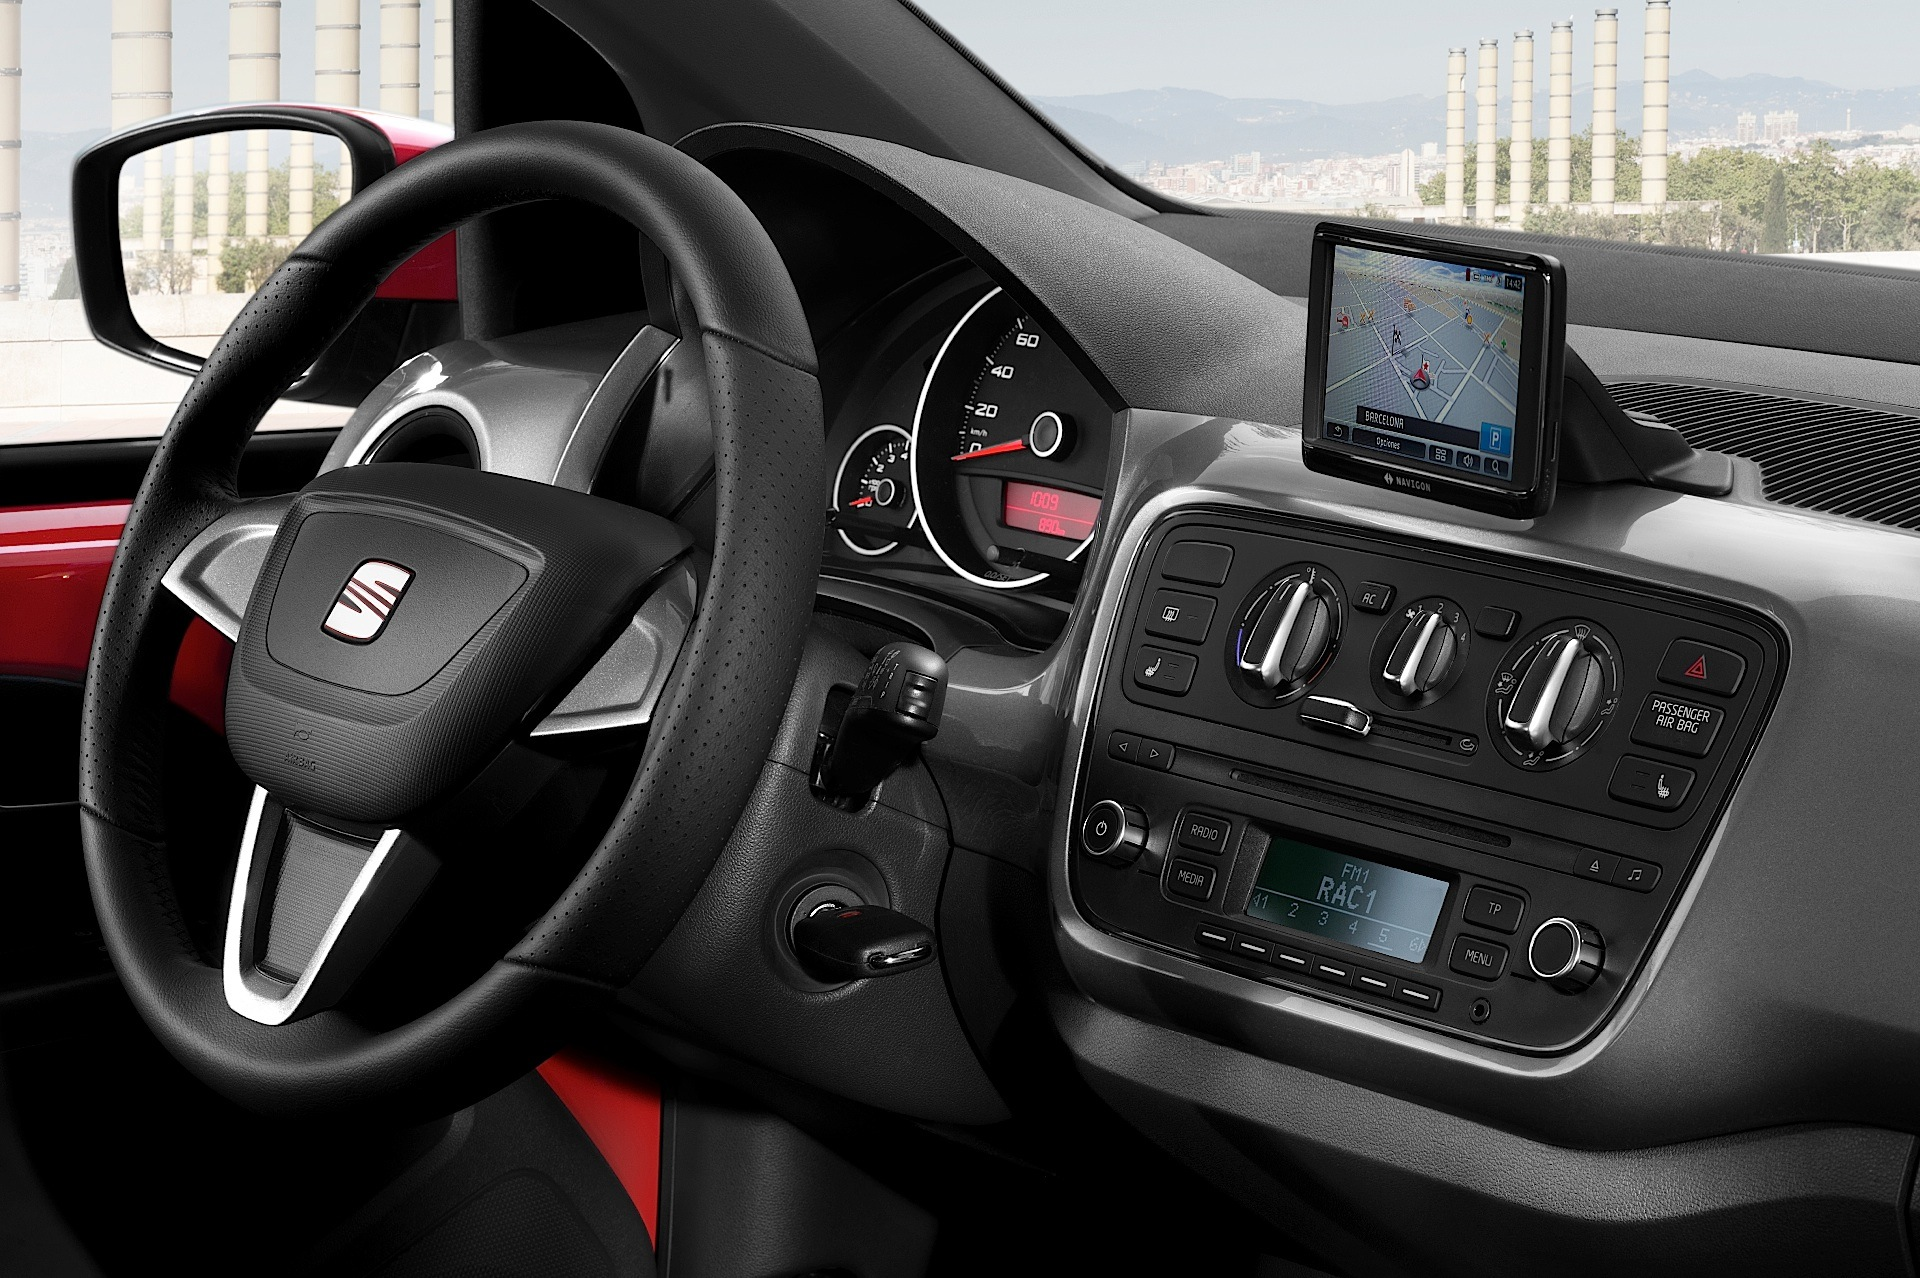 Best Value Auto >> SEAT Mii 5 doors - 2012, 2013, 2014, 2015, 2016, 2017 ...